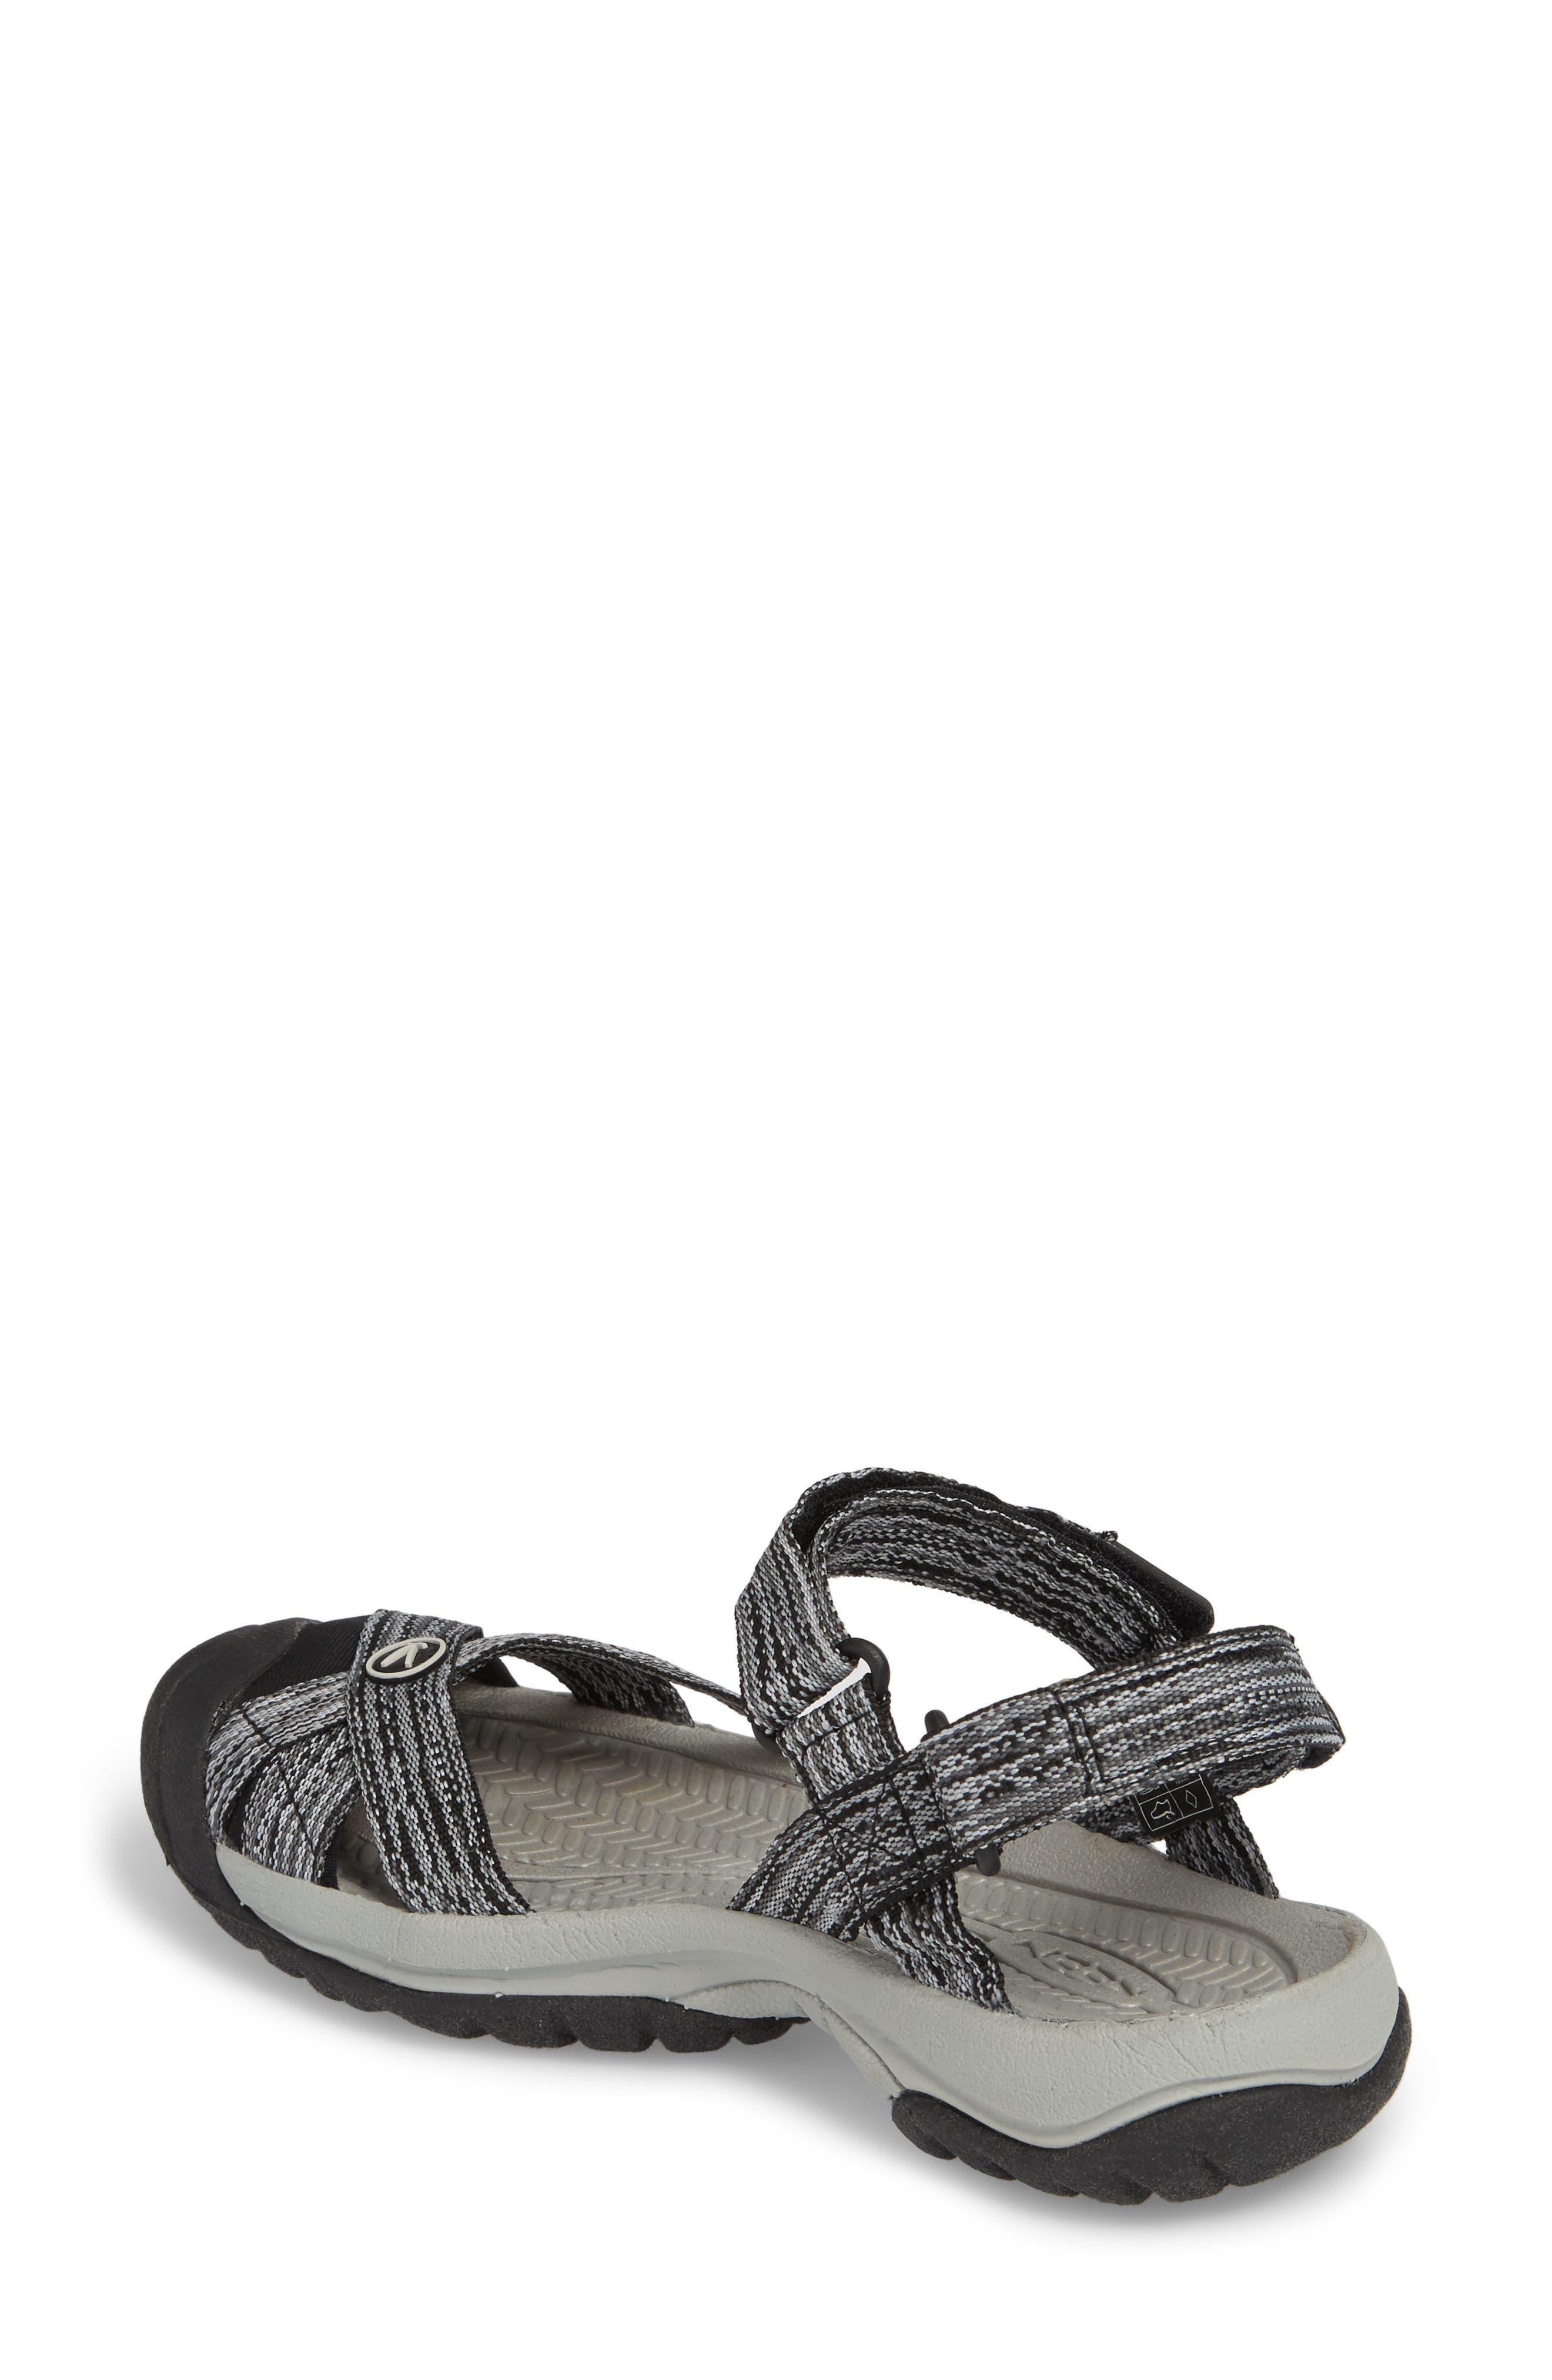 Bali Sandal,                             Alternate thumbnail 2, color,                             NEUTRAL GRAY/ BLACK